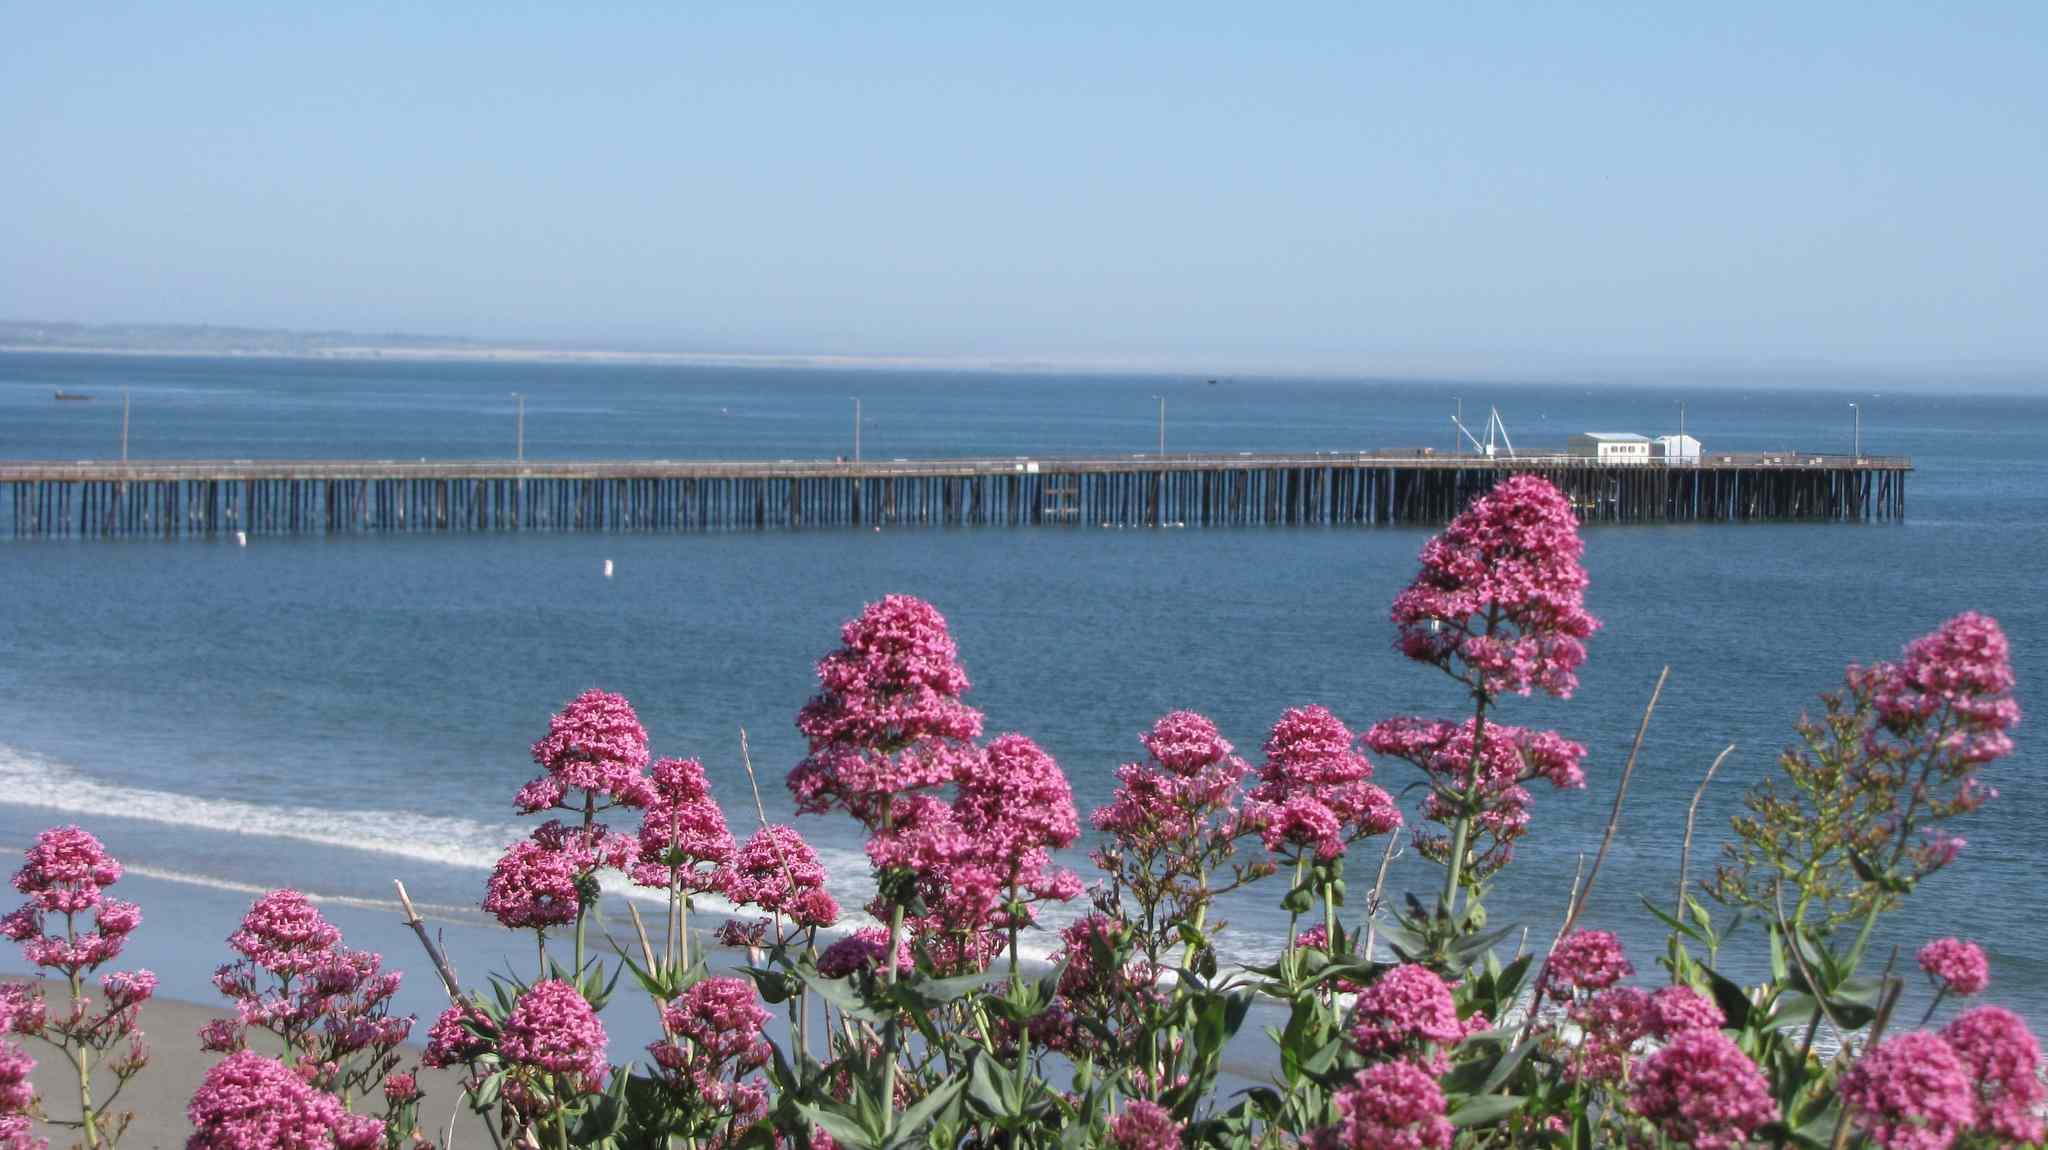 The Avila Beach Pier